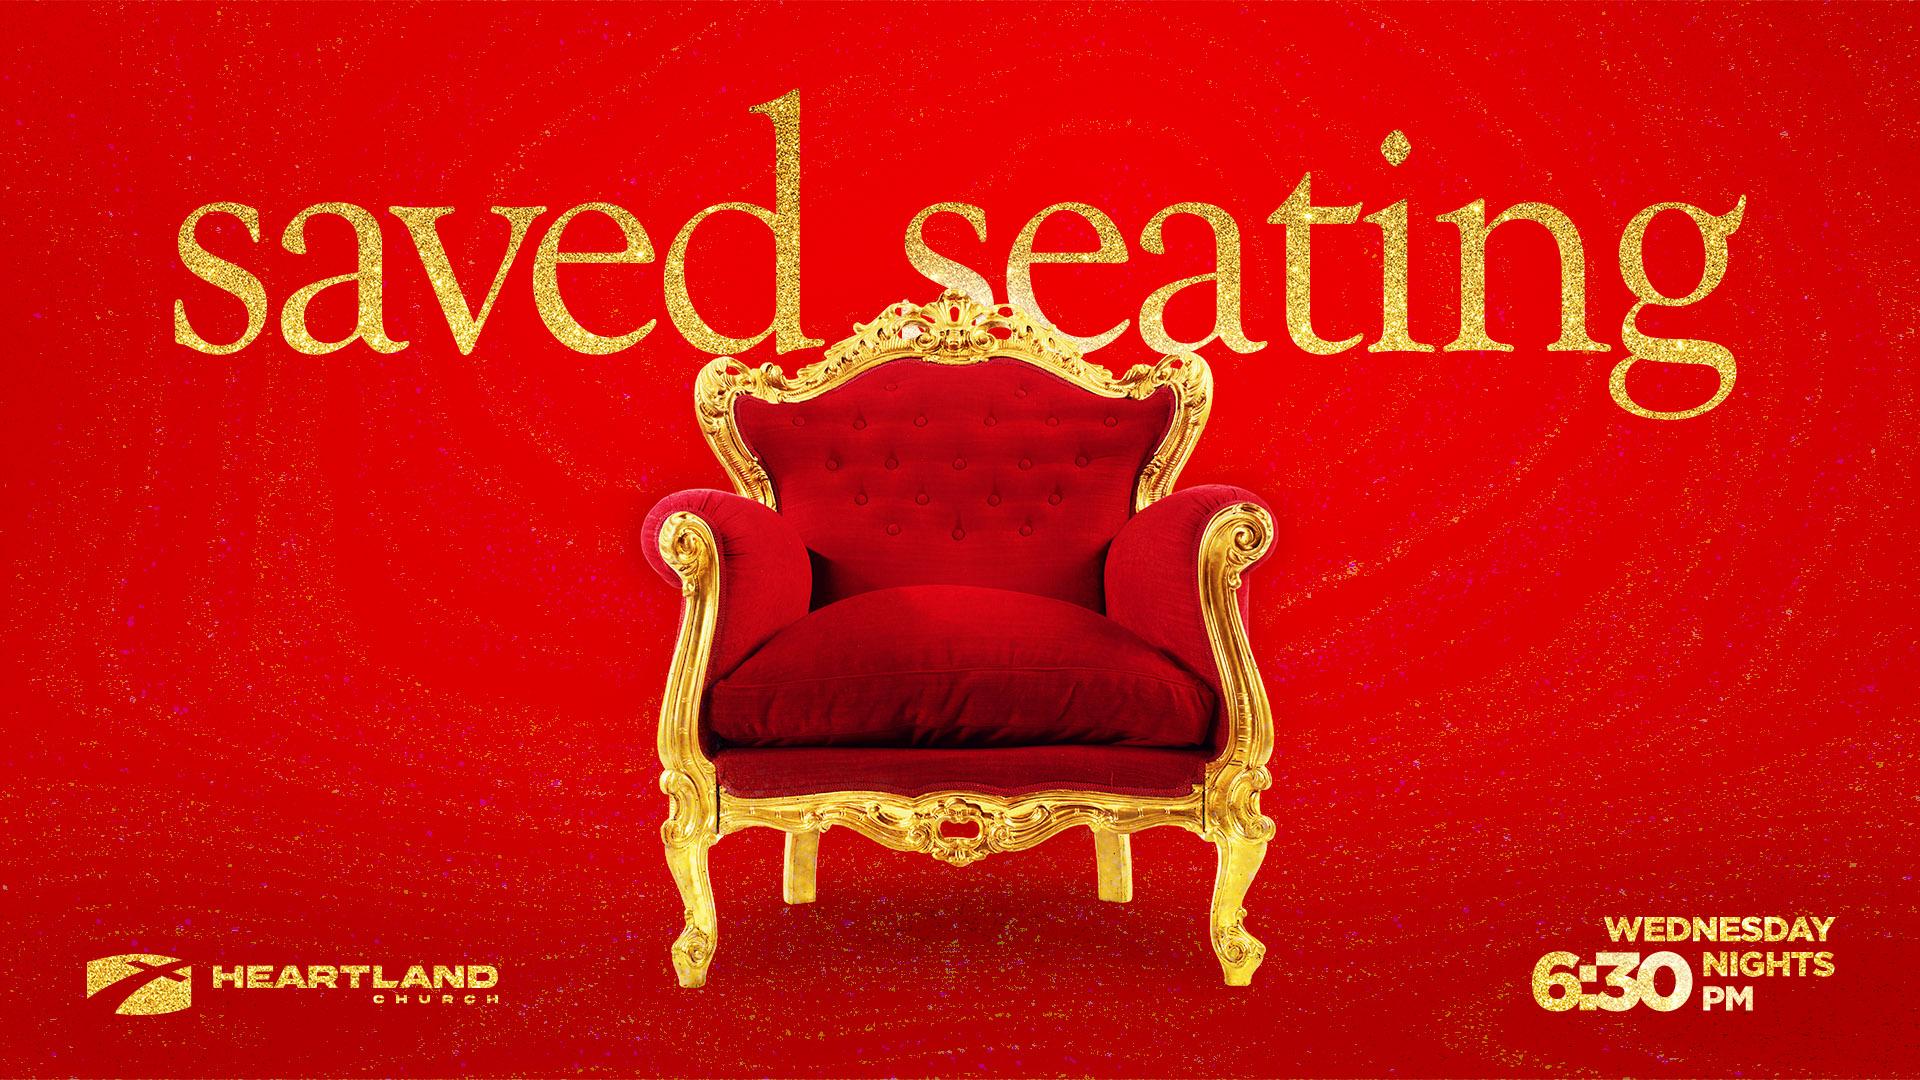 Saved Seating SERIES WED | Pastor Jason A. Gatlin | Heartland Church | Sharpsville IN